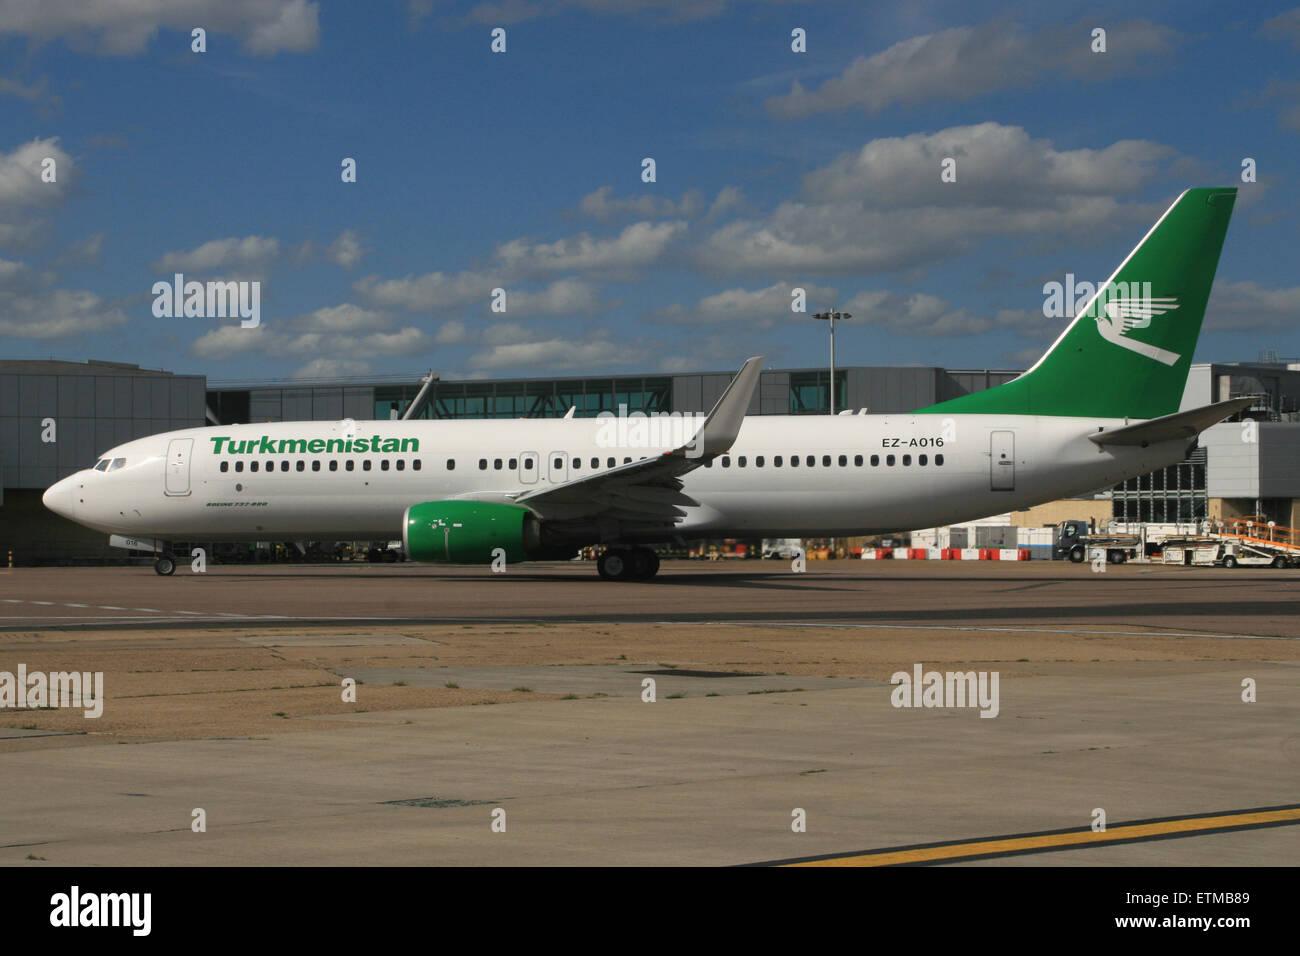 turkmenistan 737 - Stock Image